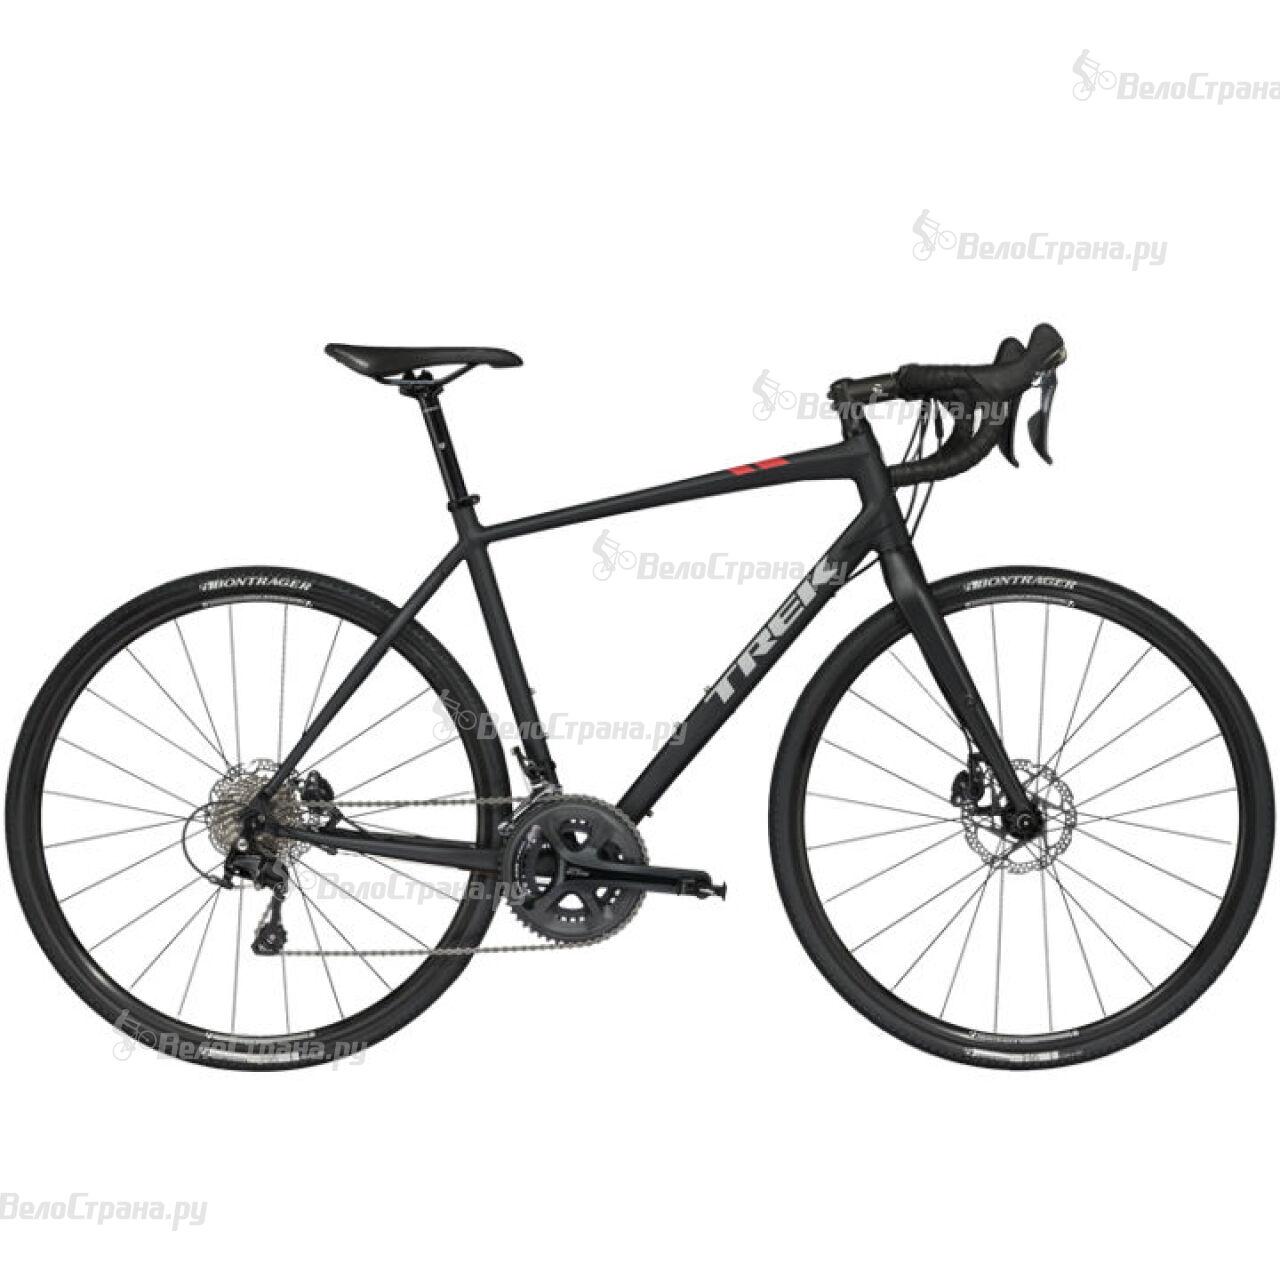 Велосипед Trek CrossRip 3 (2017) велосипед trek crossrip 2013